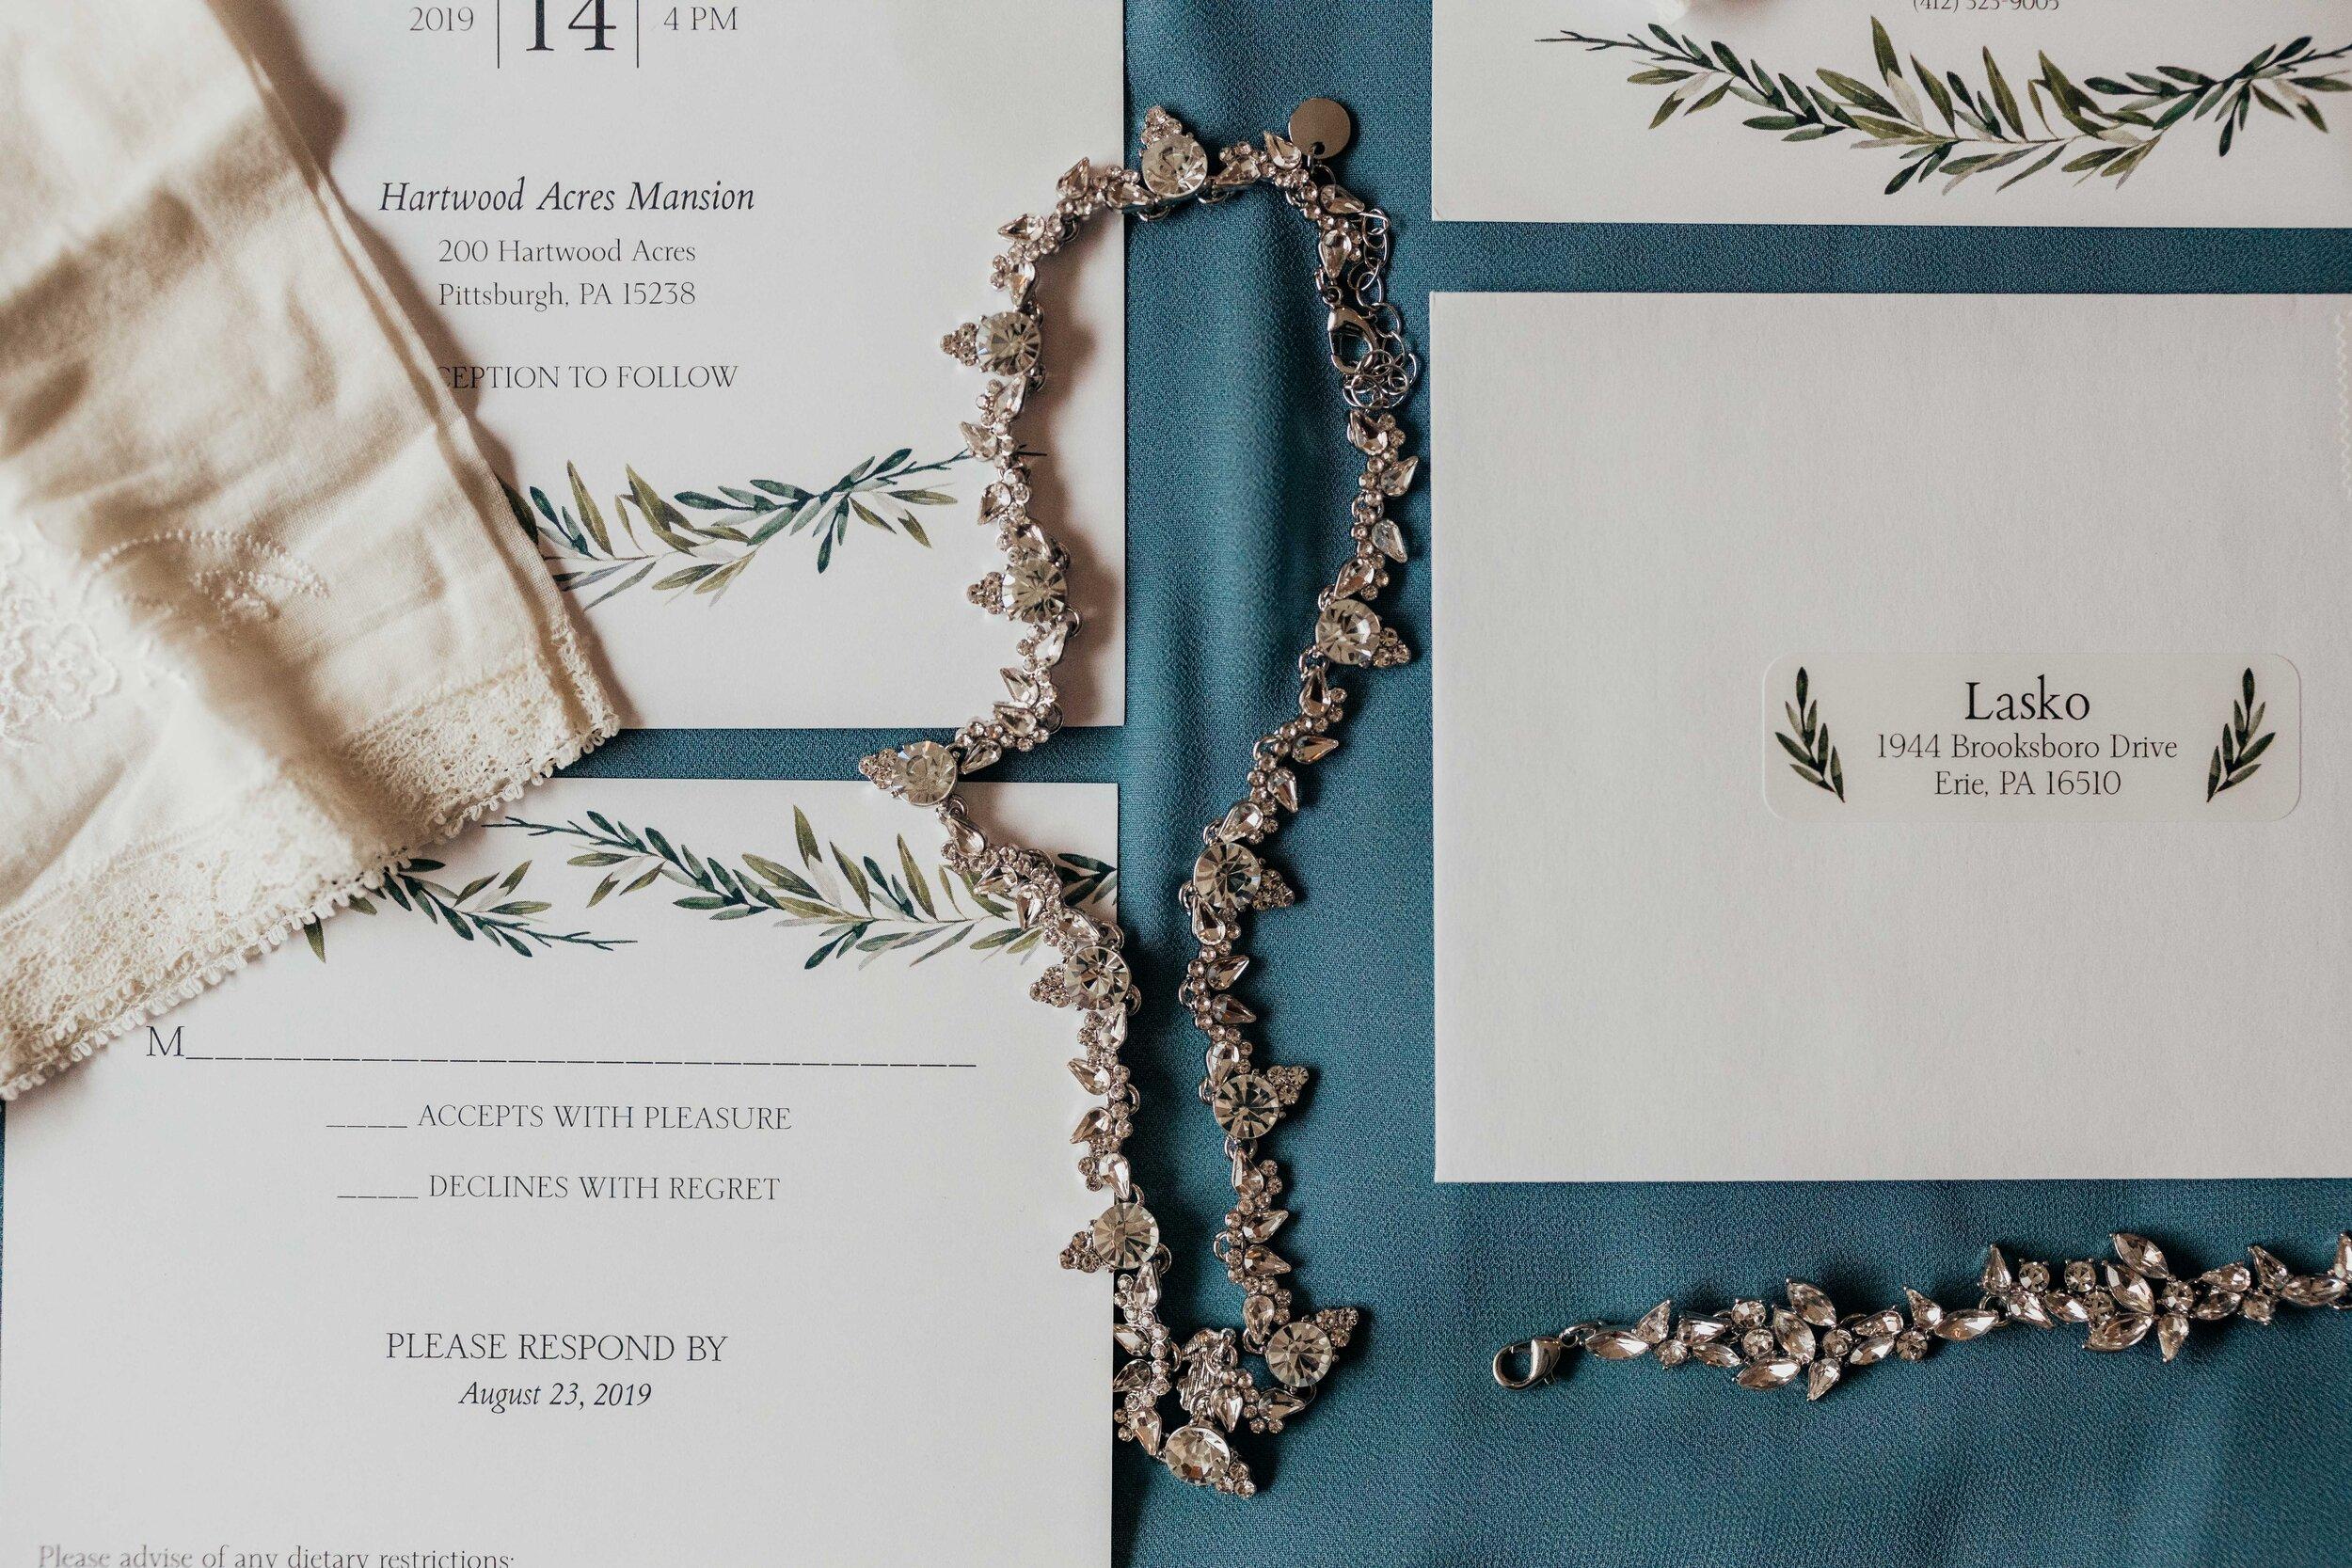 Pittsburgh wedding photography - Hartwood Acres Mansion wedding-20.jpg